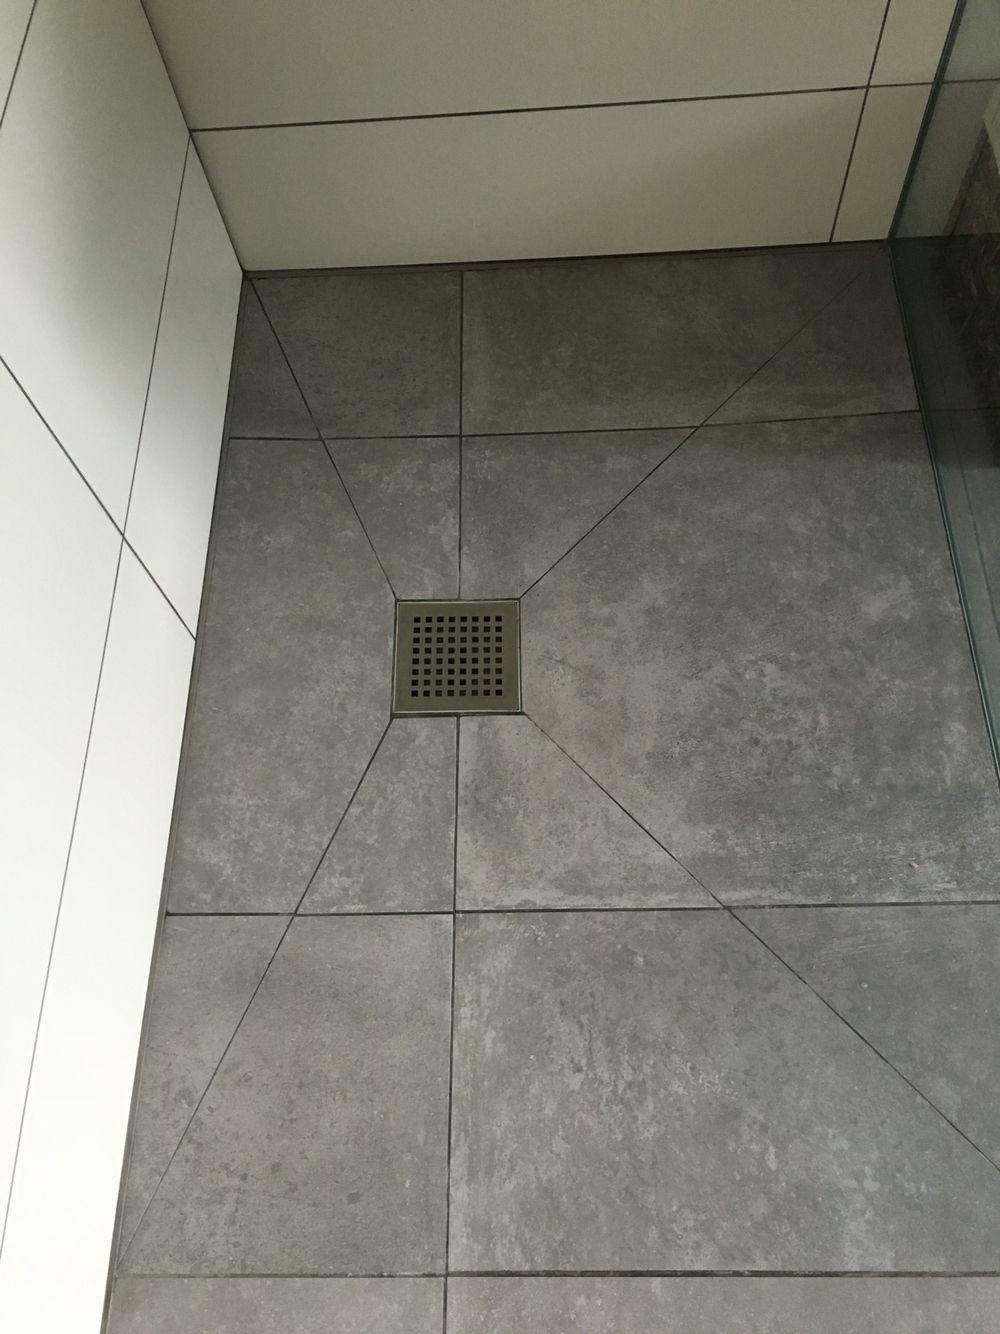 Wet room shower floor with diagonal cuts. #wetrooms